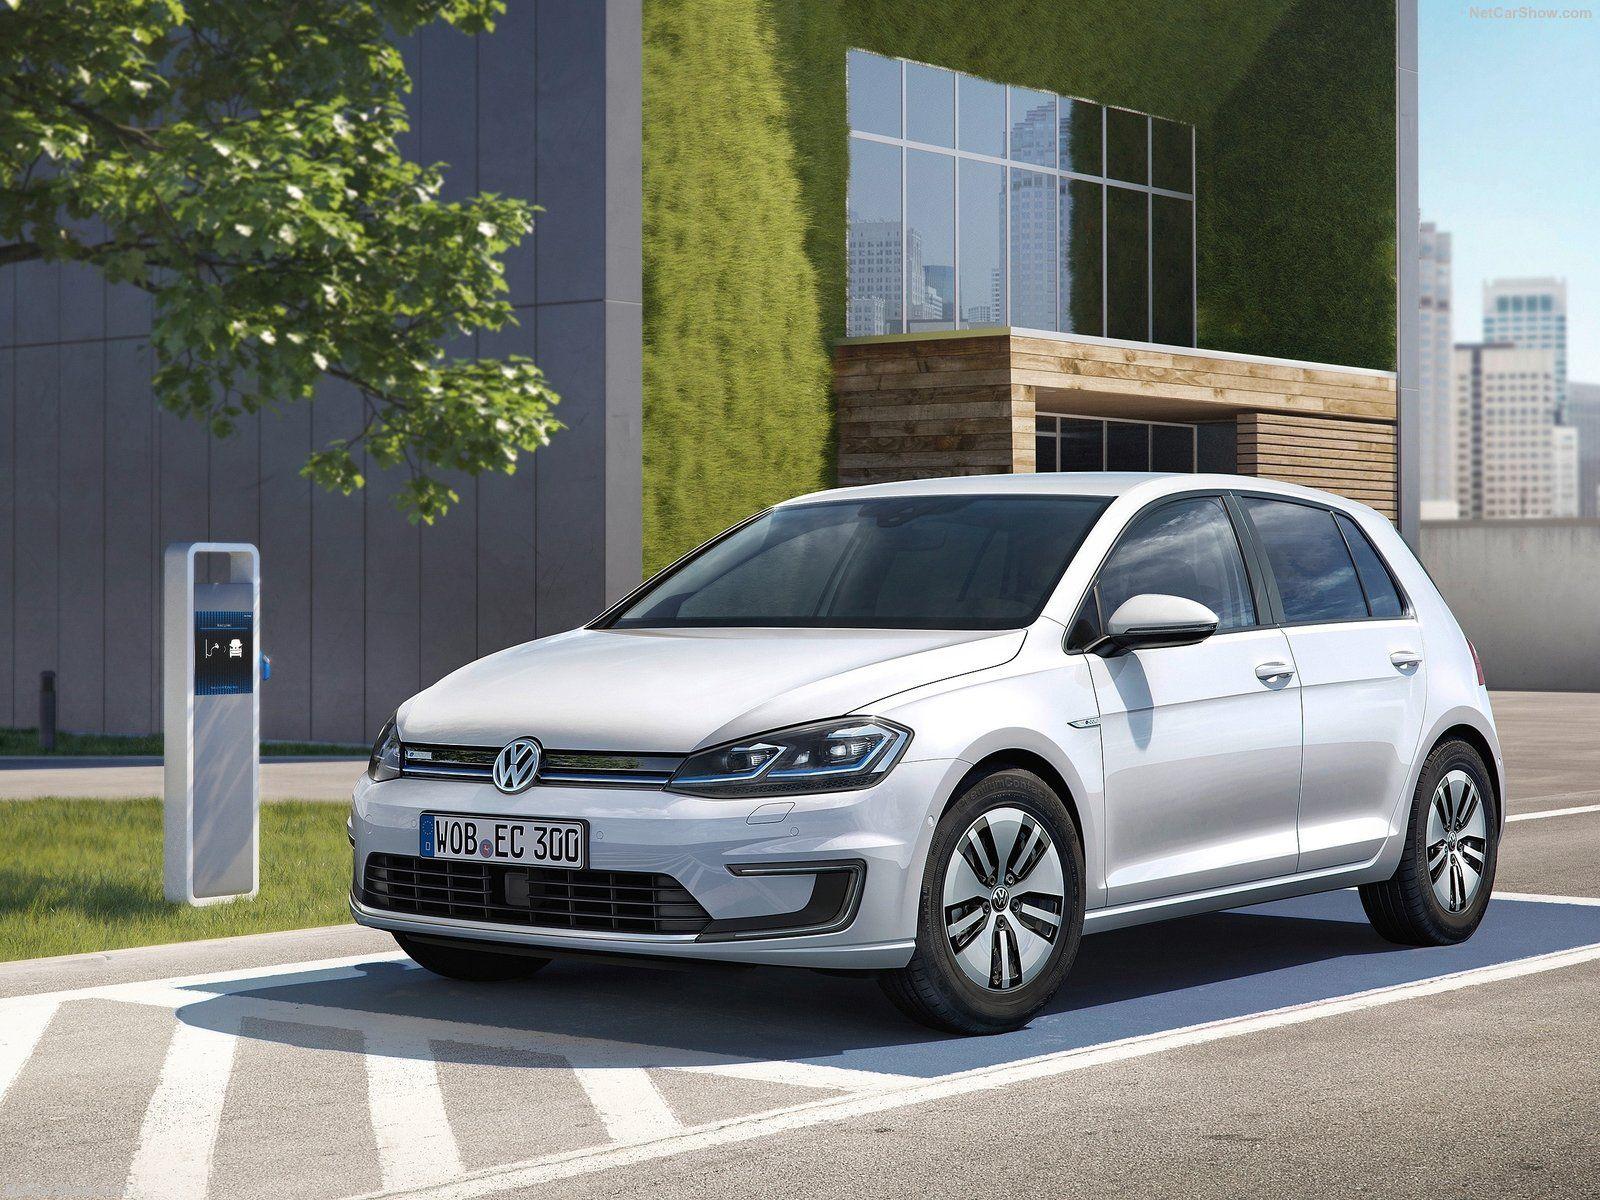 2017 Volkswagen E Golf